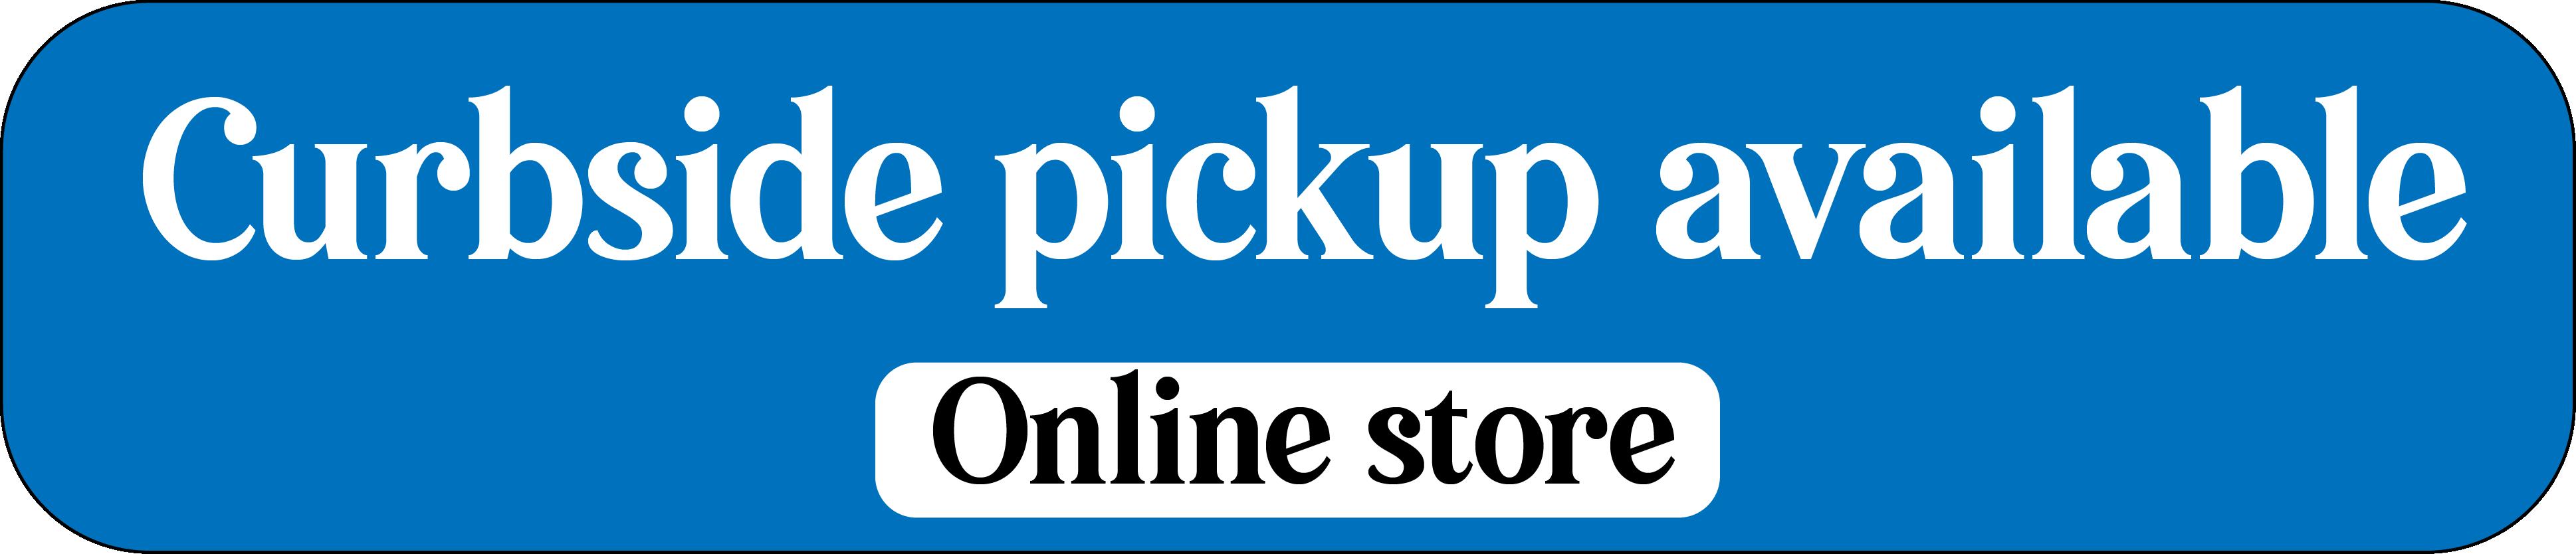 Online Store Button